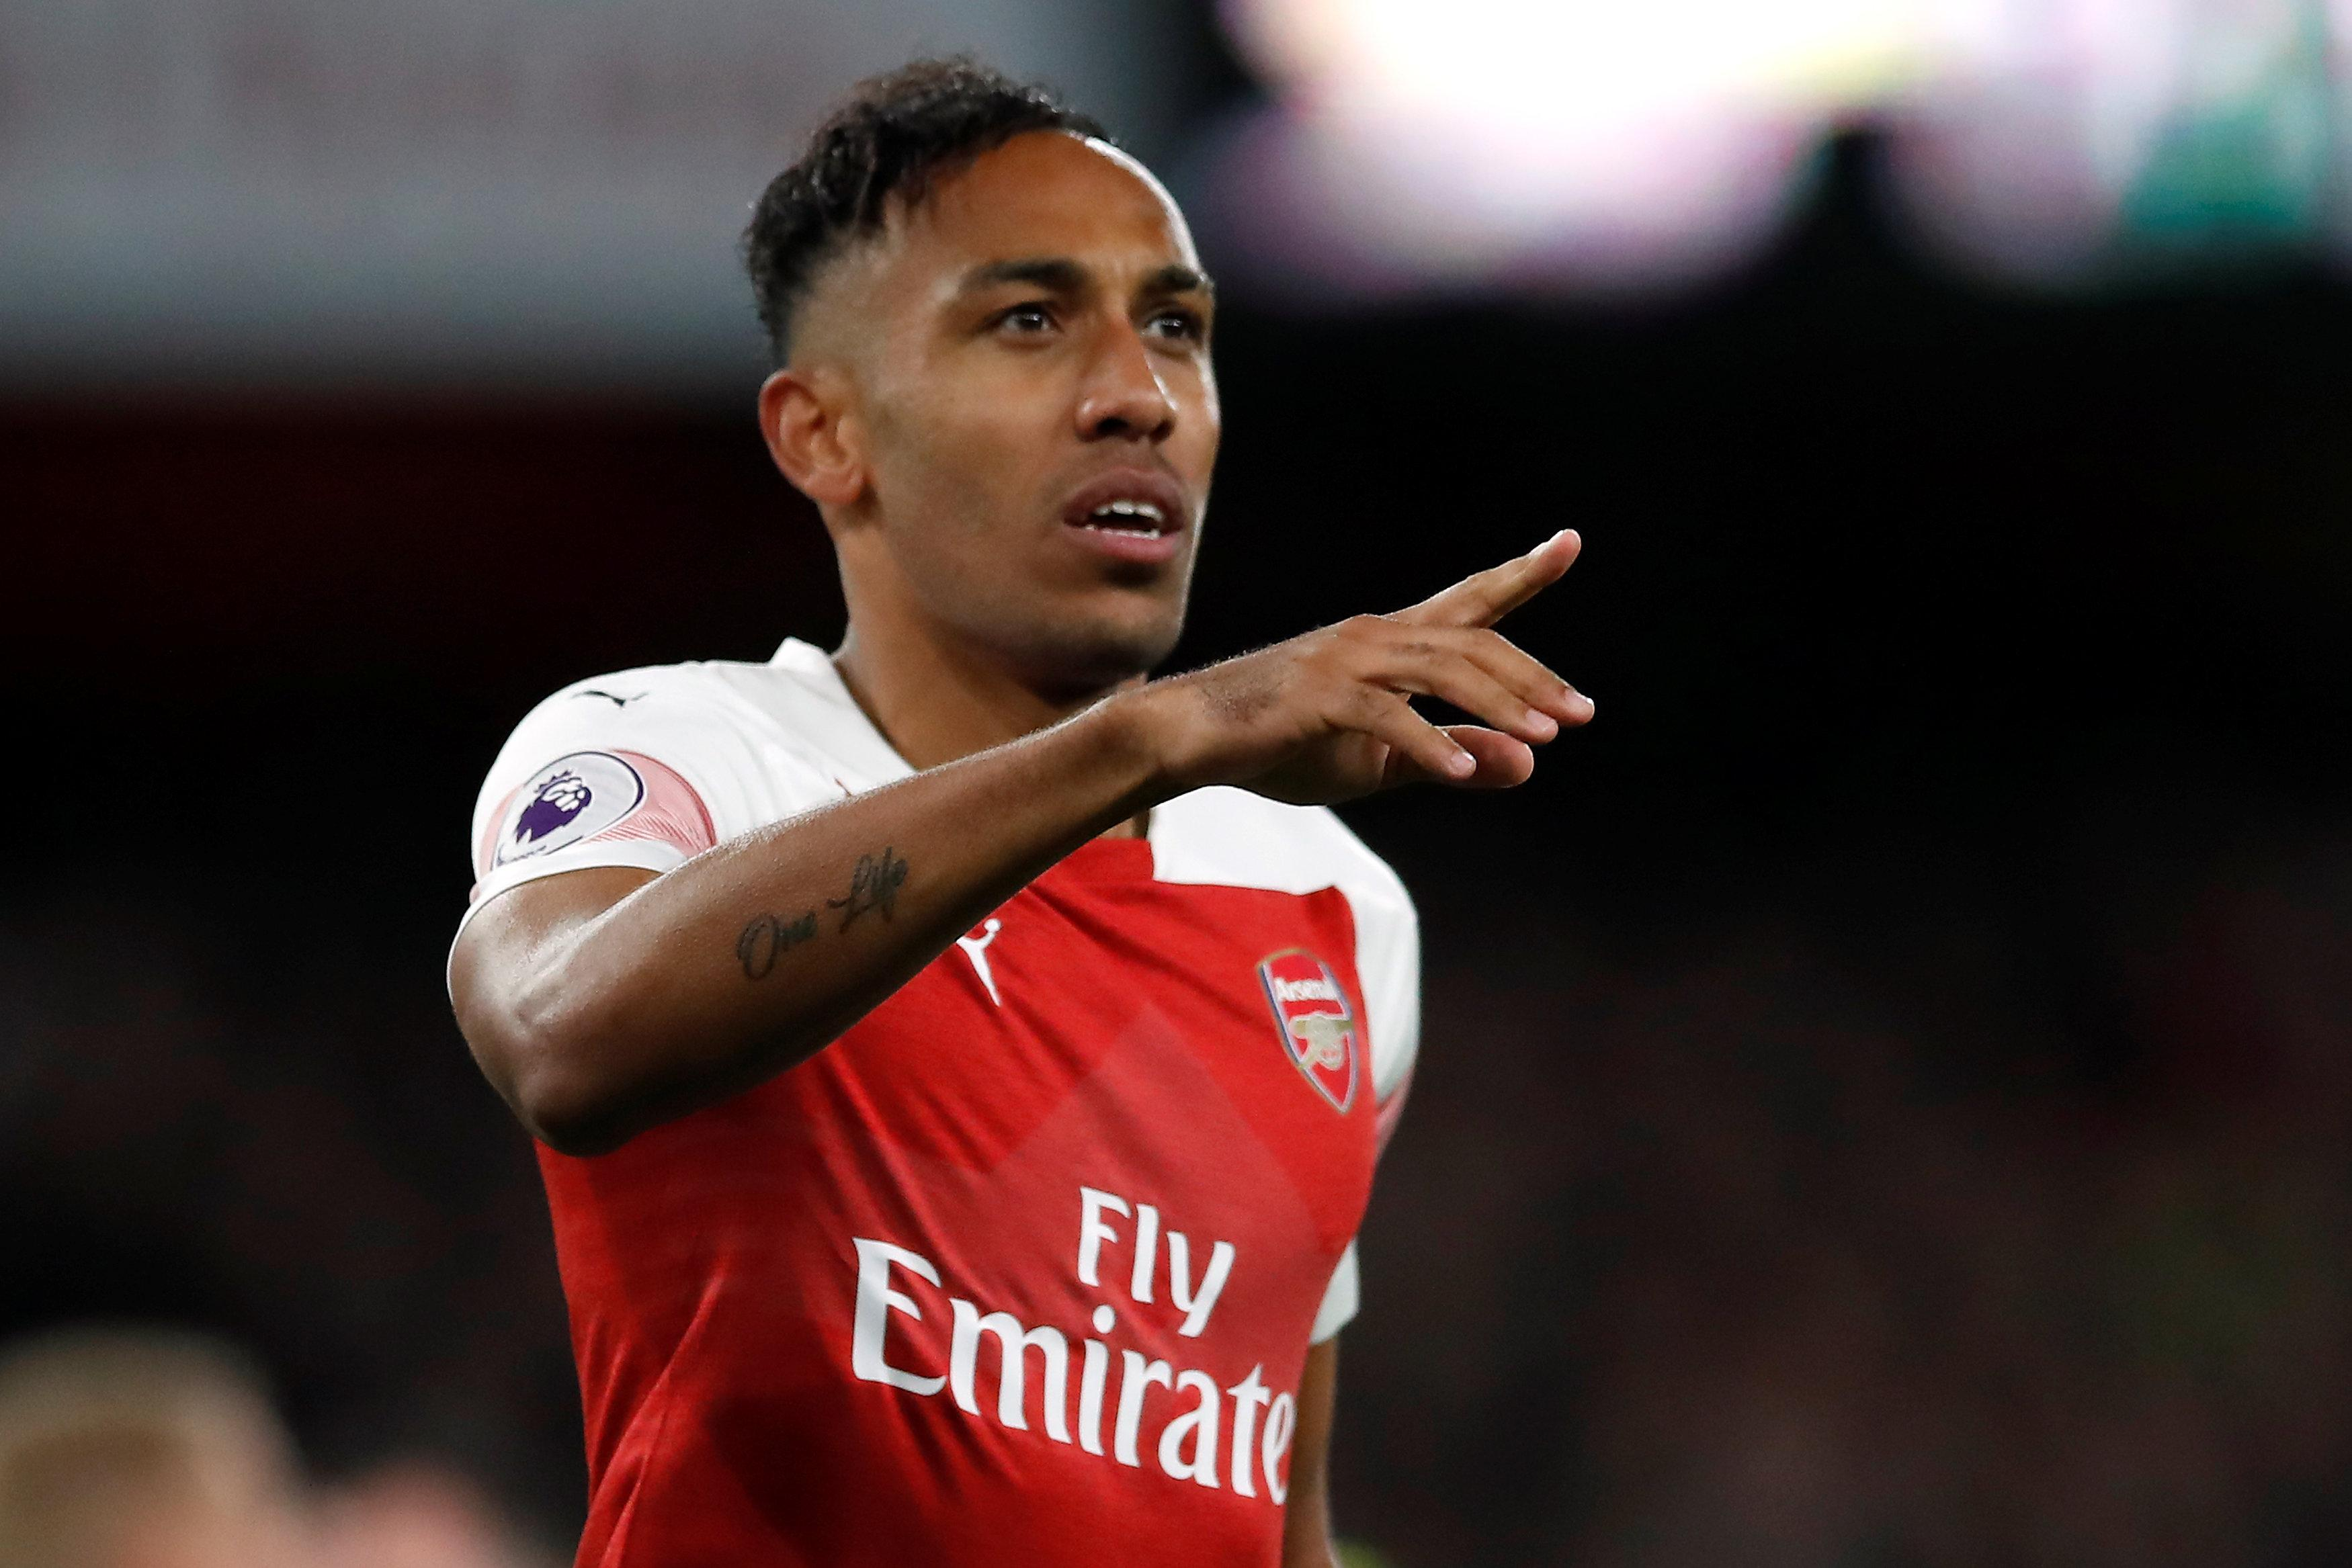 Pierre-Emerick Aubameyang scored twice as Arsenal beat Leicester 3-1